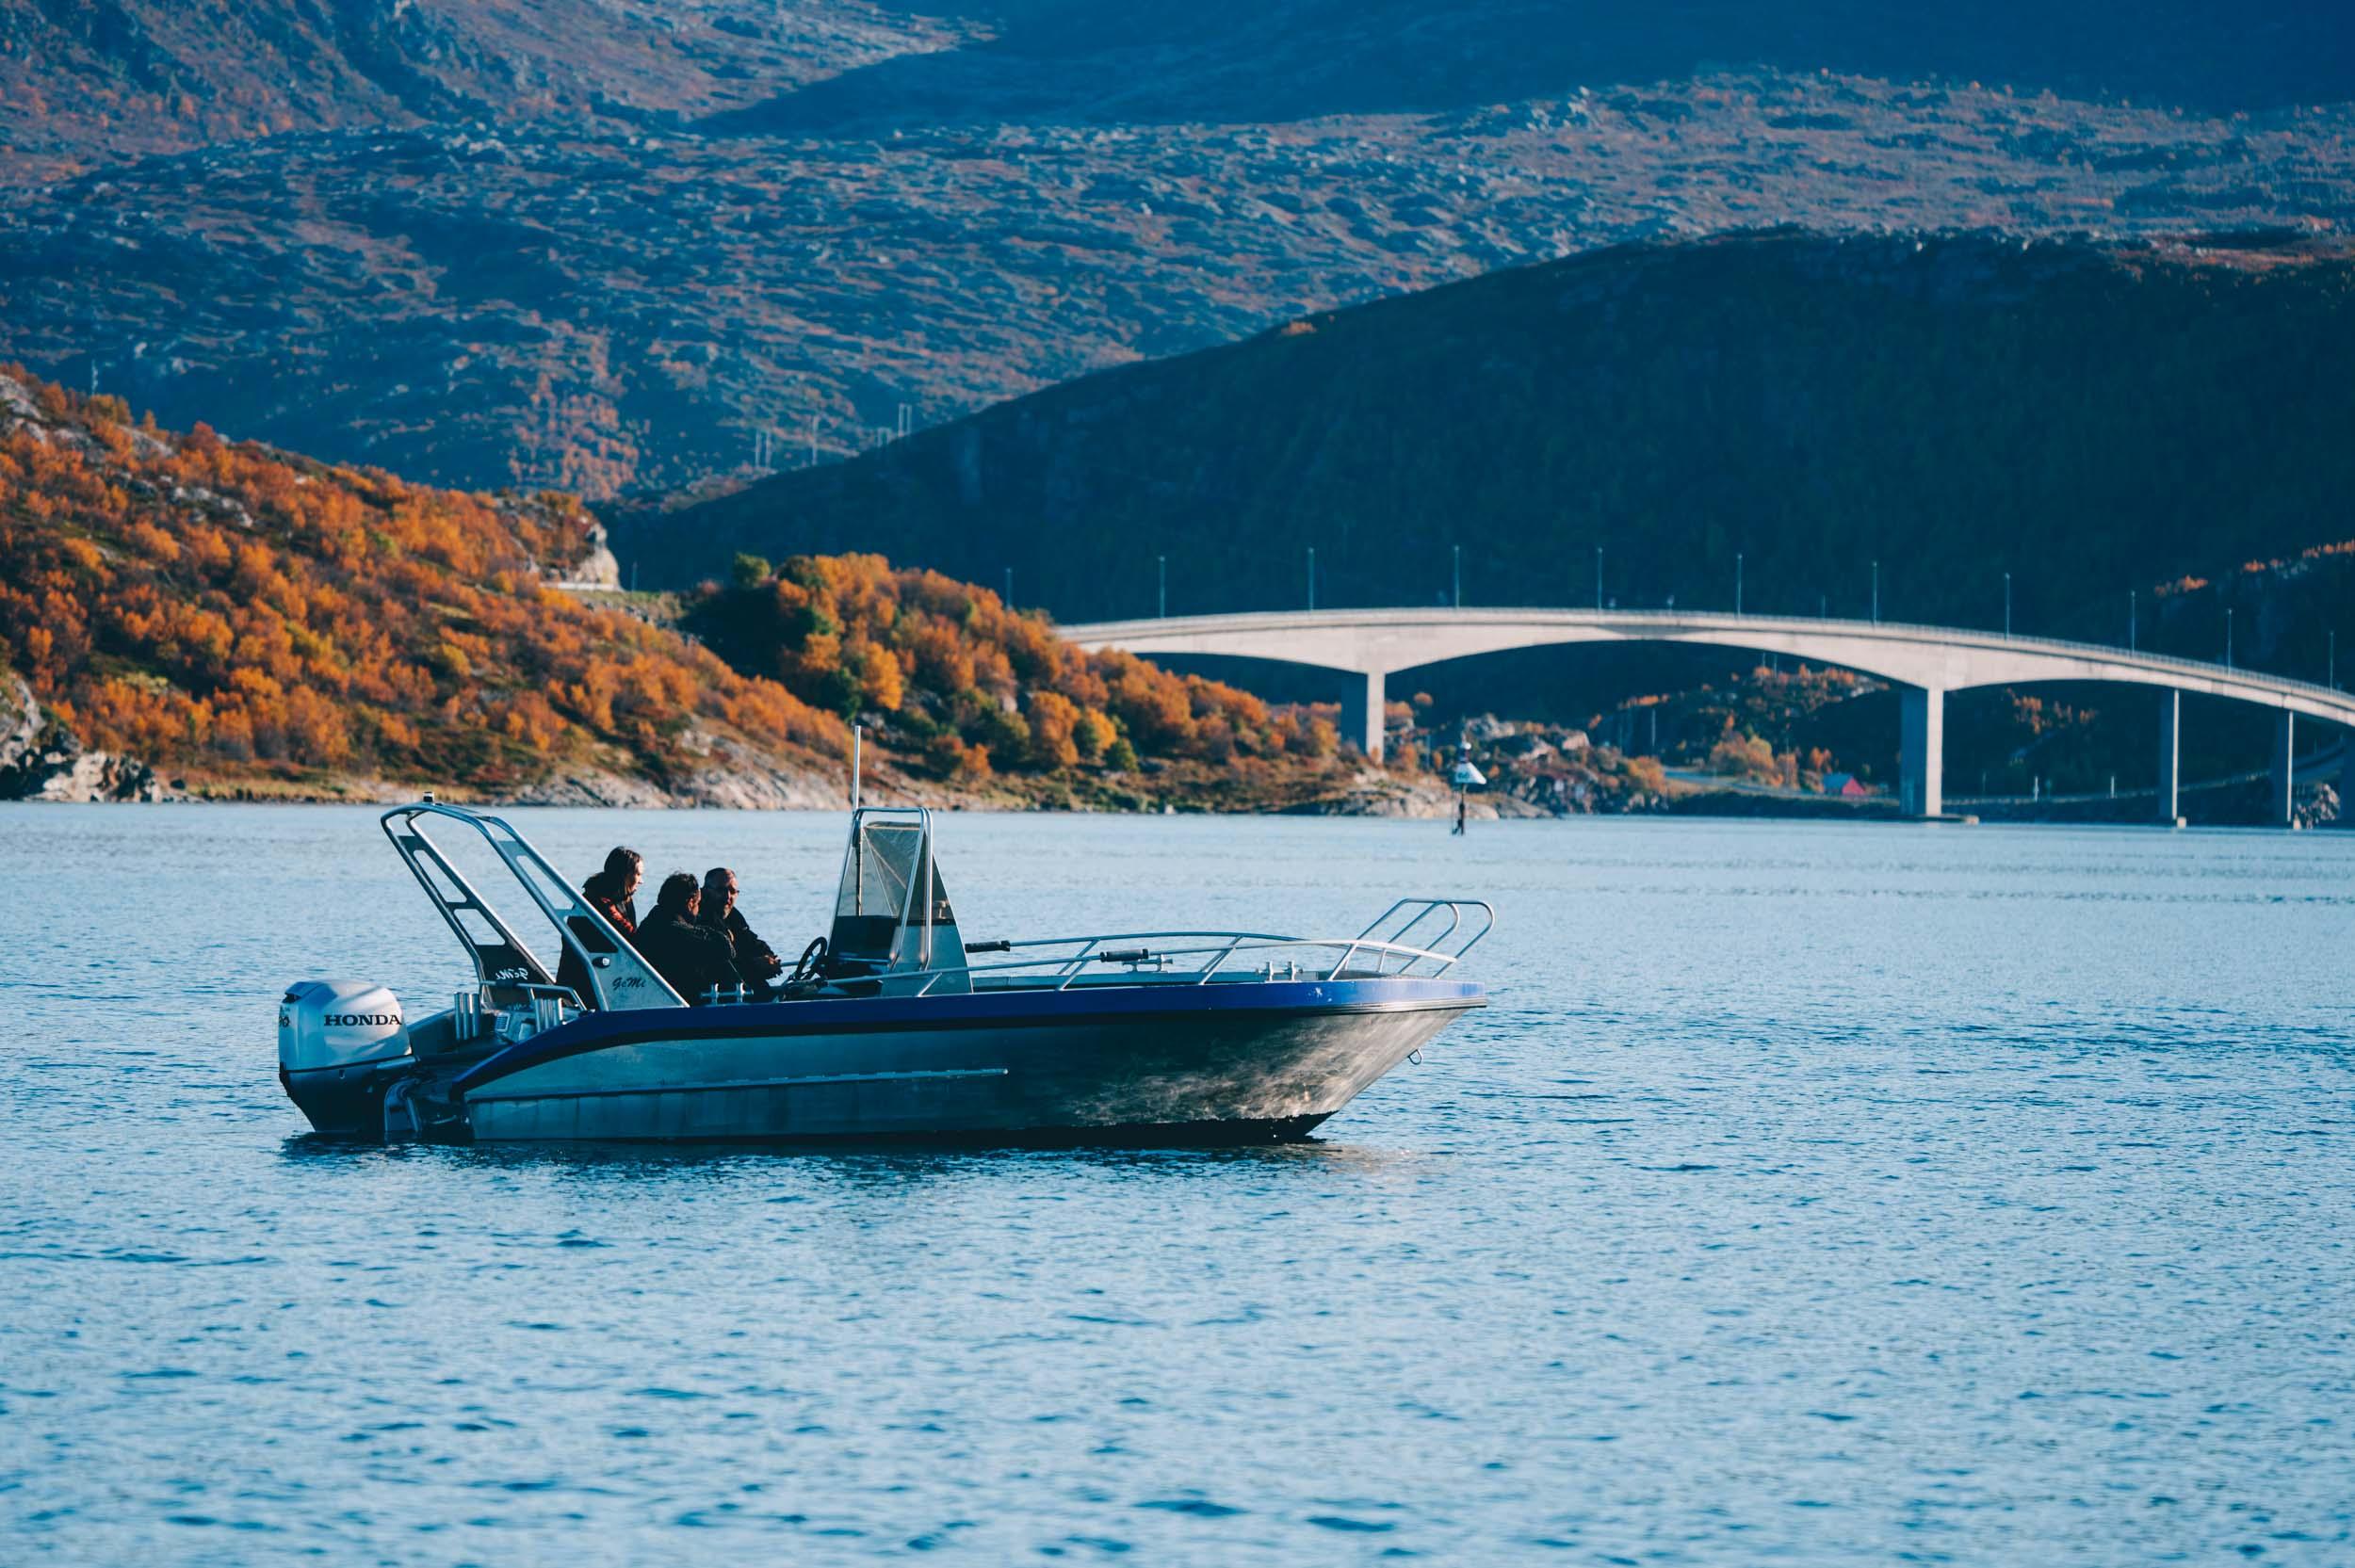 Turister i båt på Sommarøy